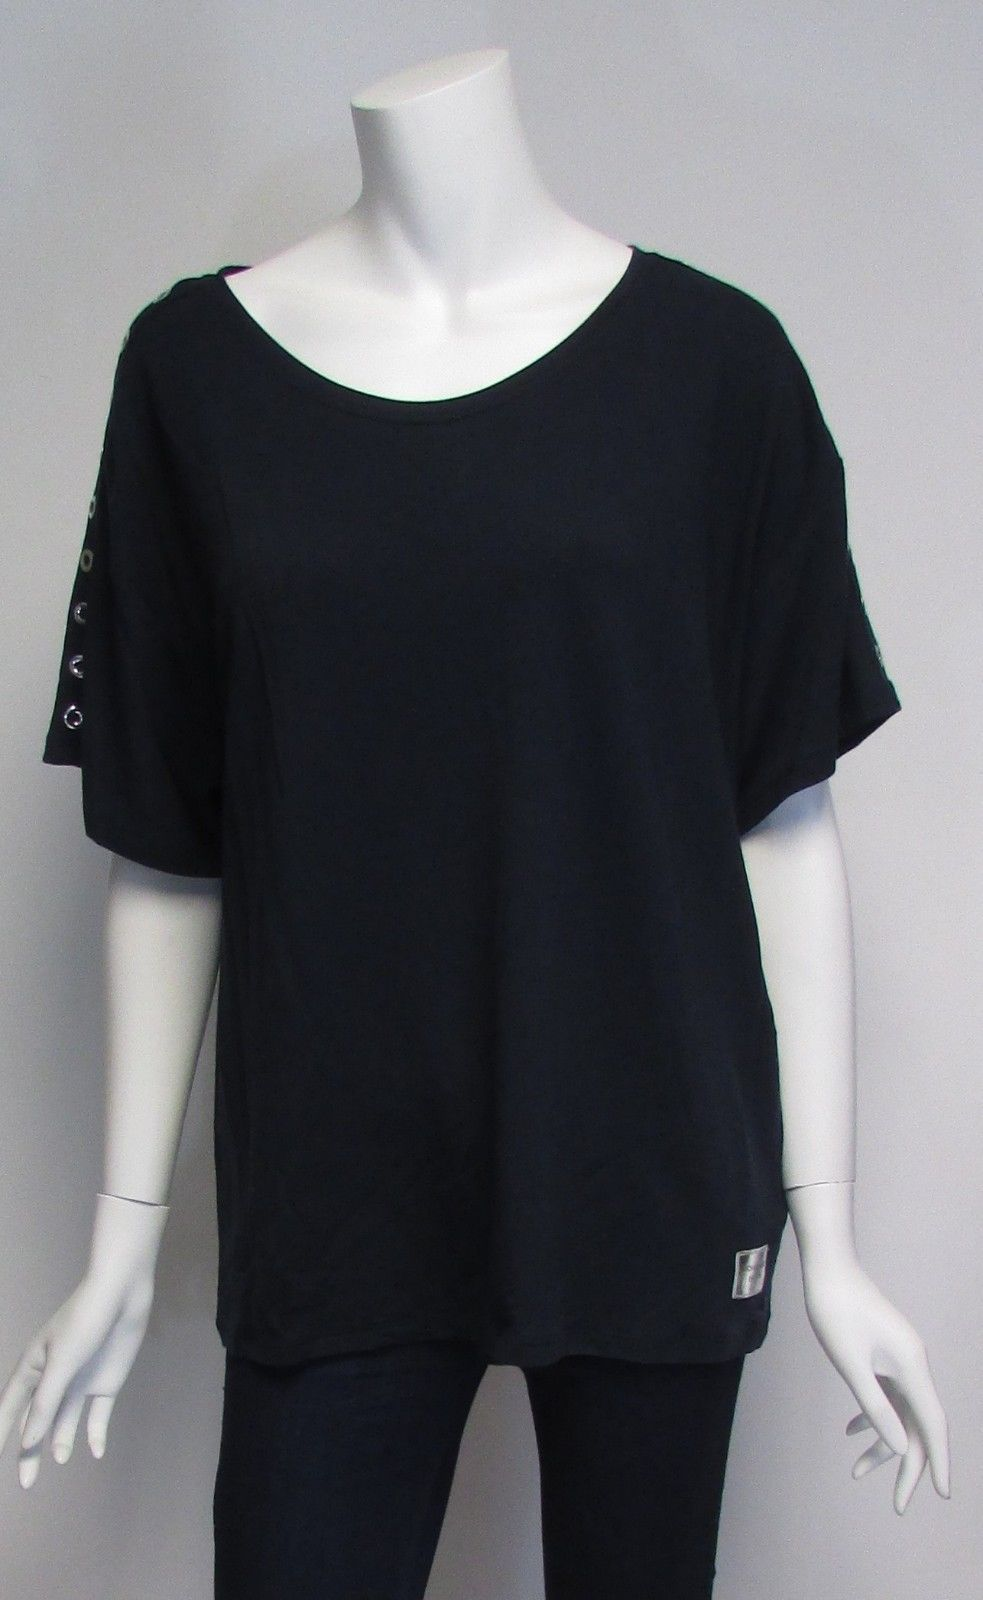 Michael Kors Evening Dress (1980s): 1 listing